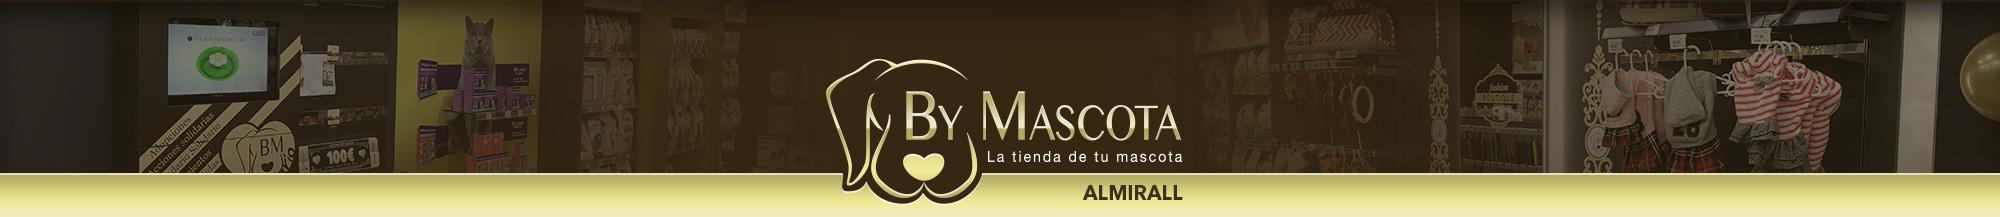 By Mascota Almirall